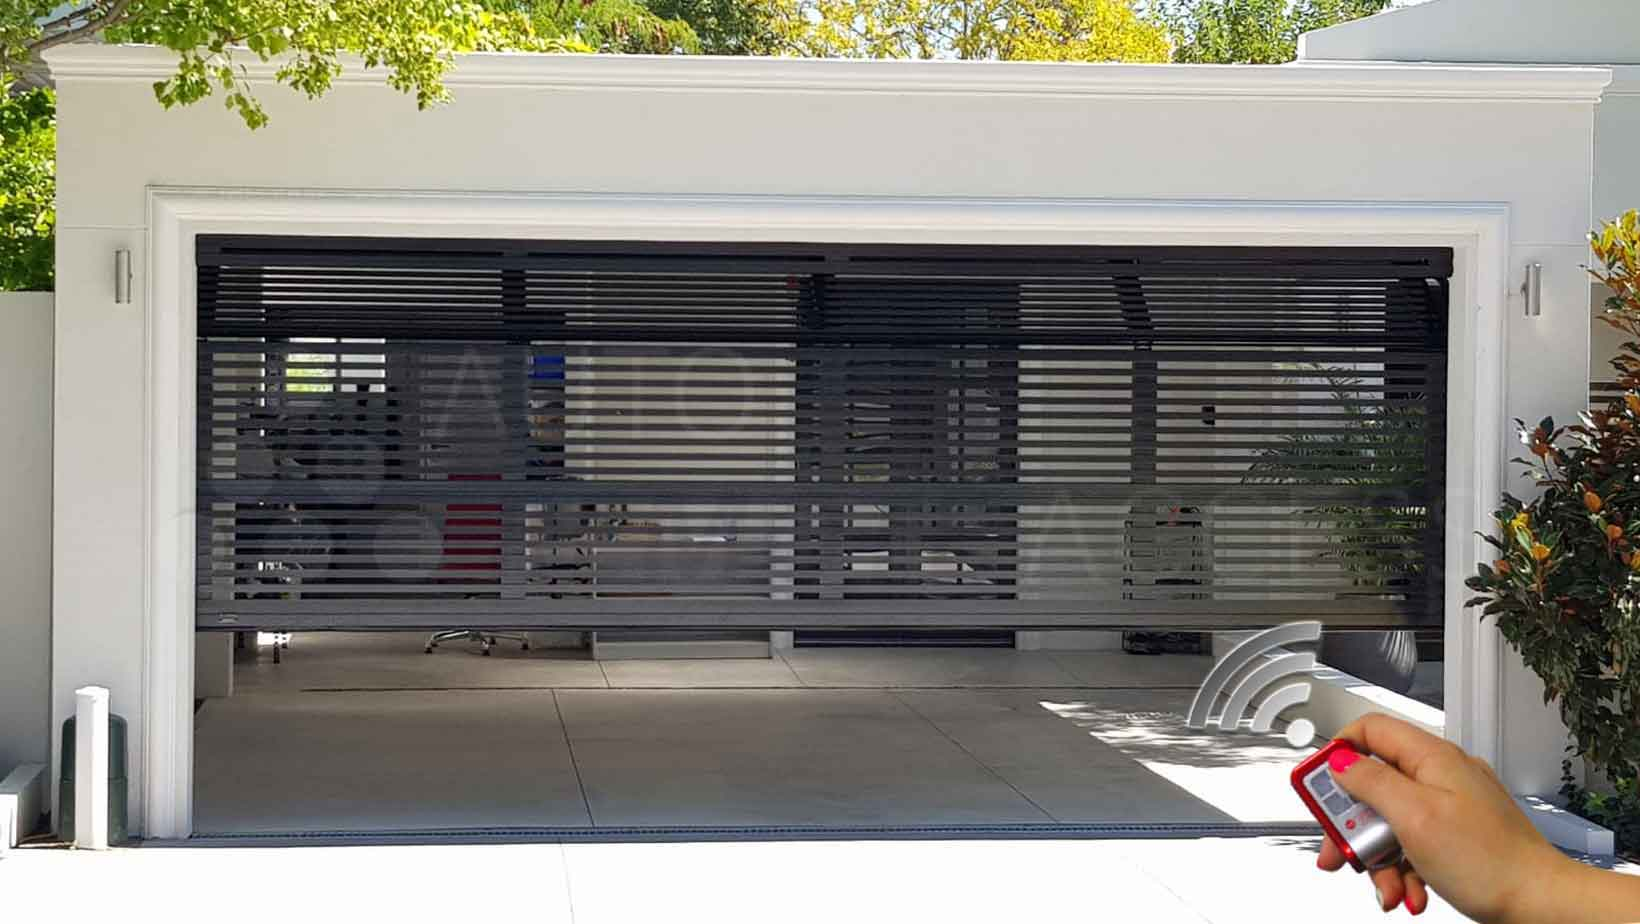 Remote control garage door opener installation Araccess